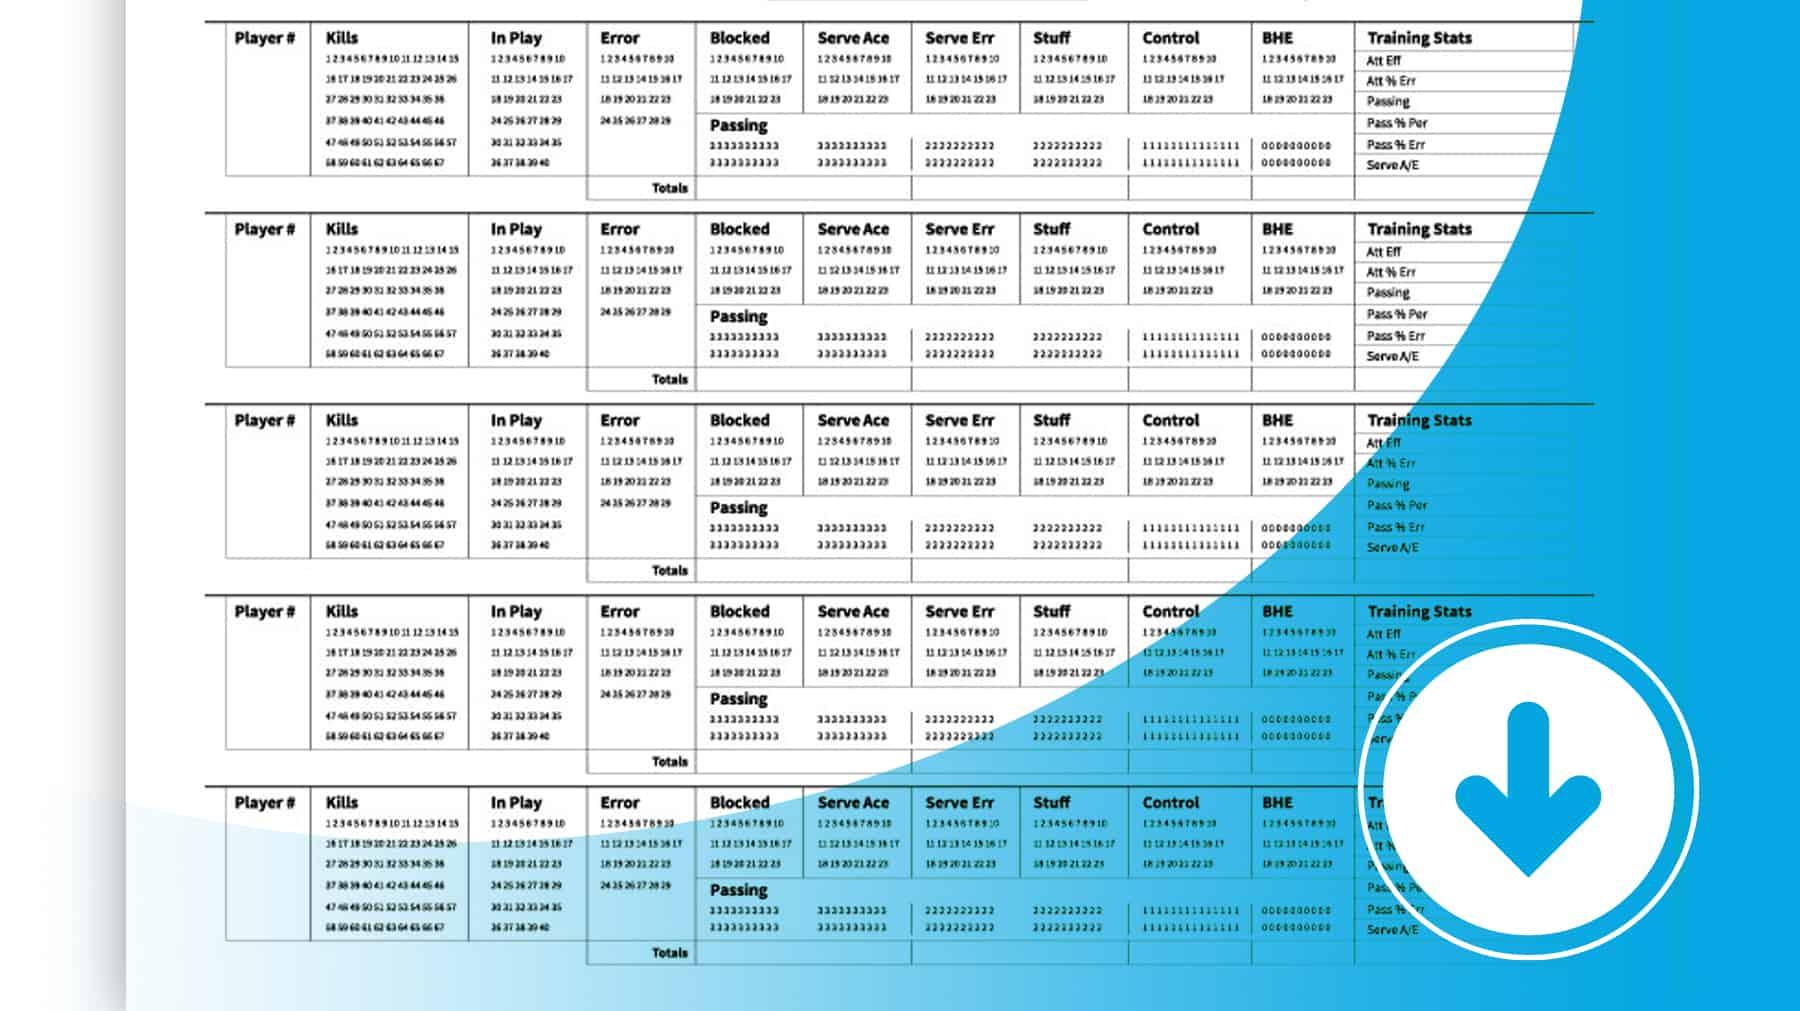 Training Stats Recorder Sheets